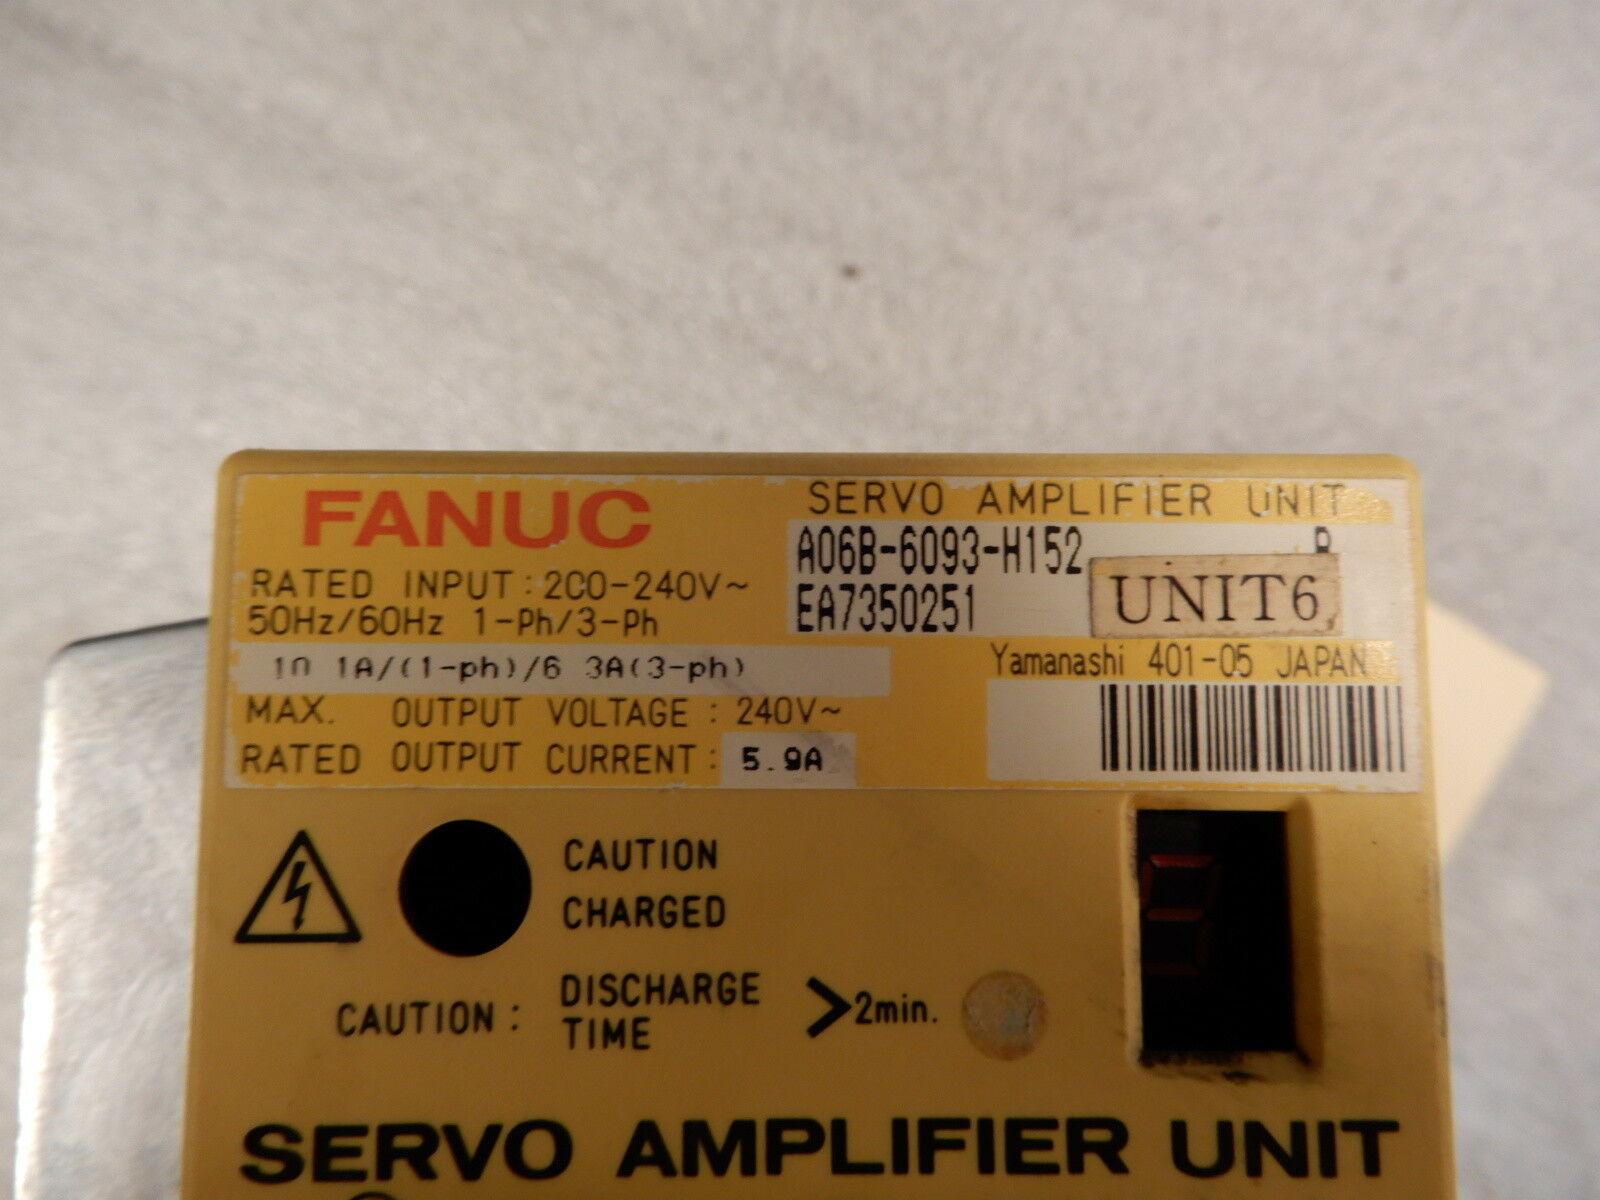 FANUC Servo Amplifier Unit A06B-6093-H152